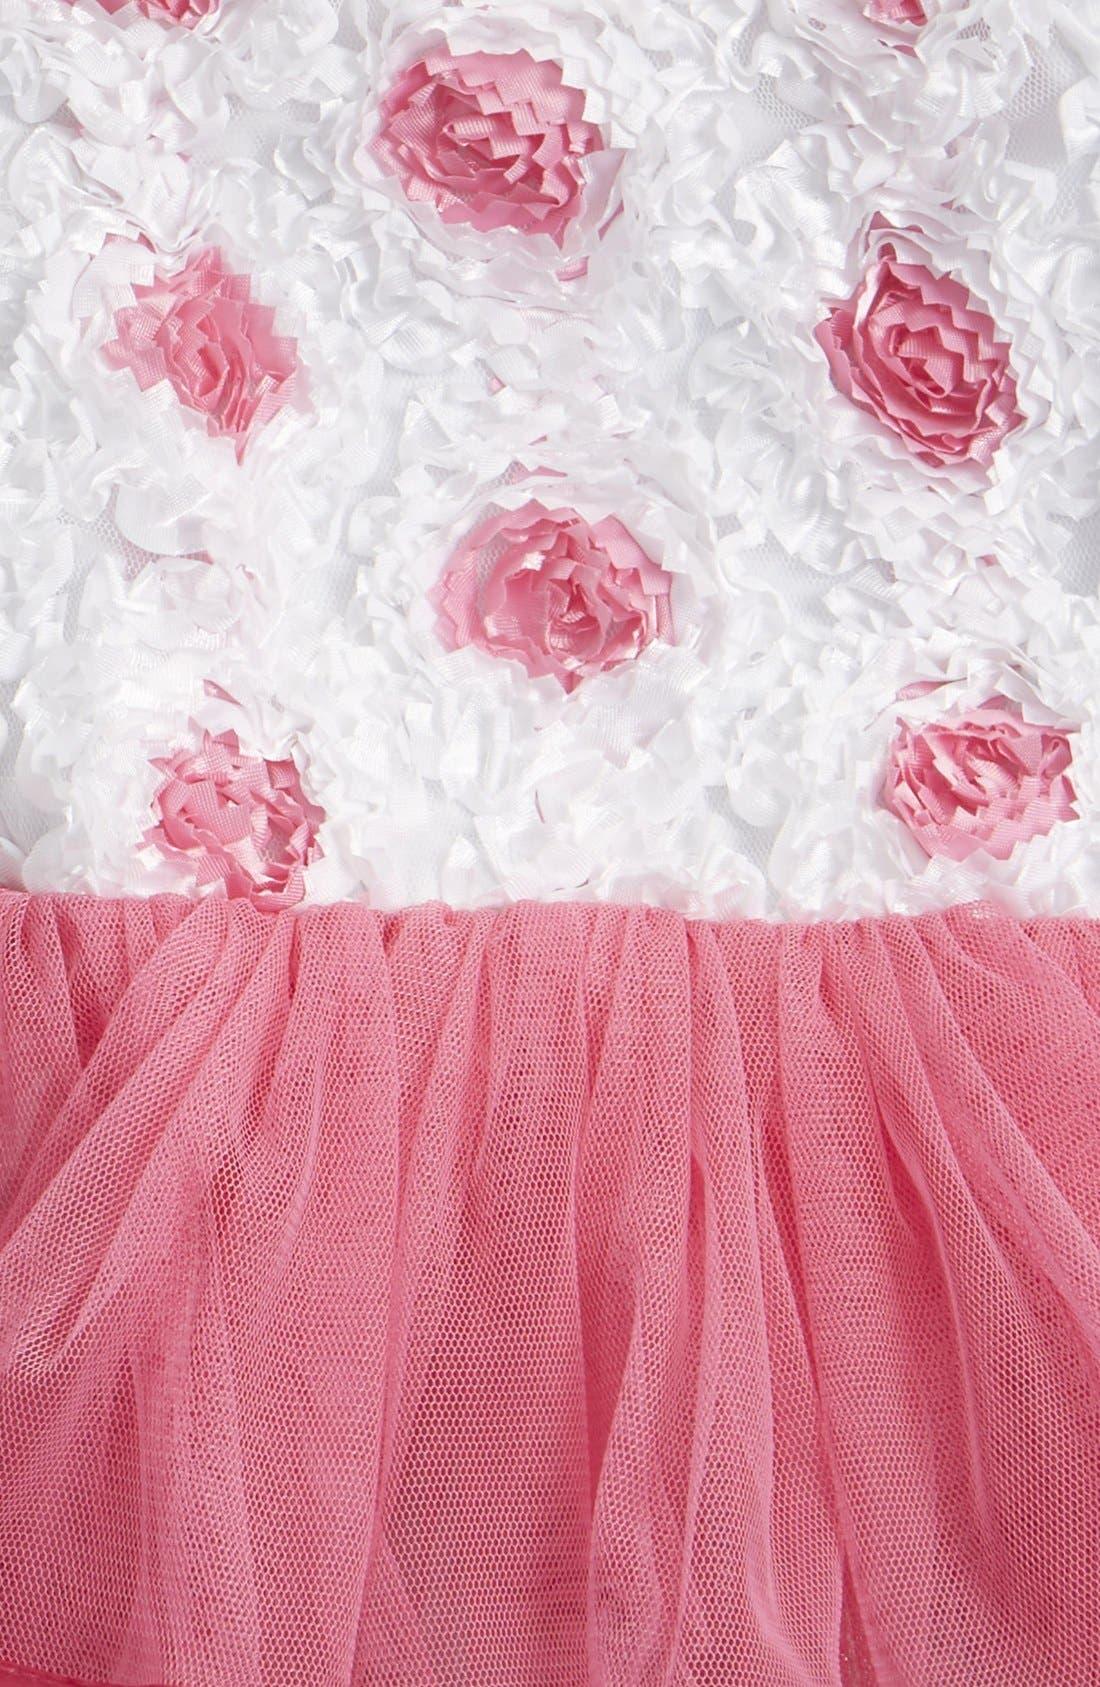 Alternate Image 3  - Popatu Soutache Floral Tutu Dress (Baby Girls)